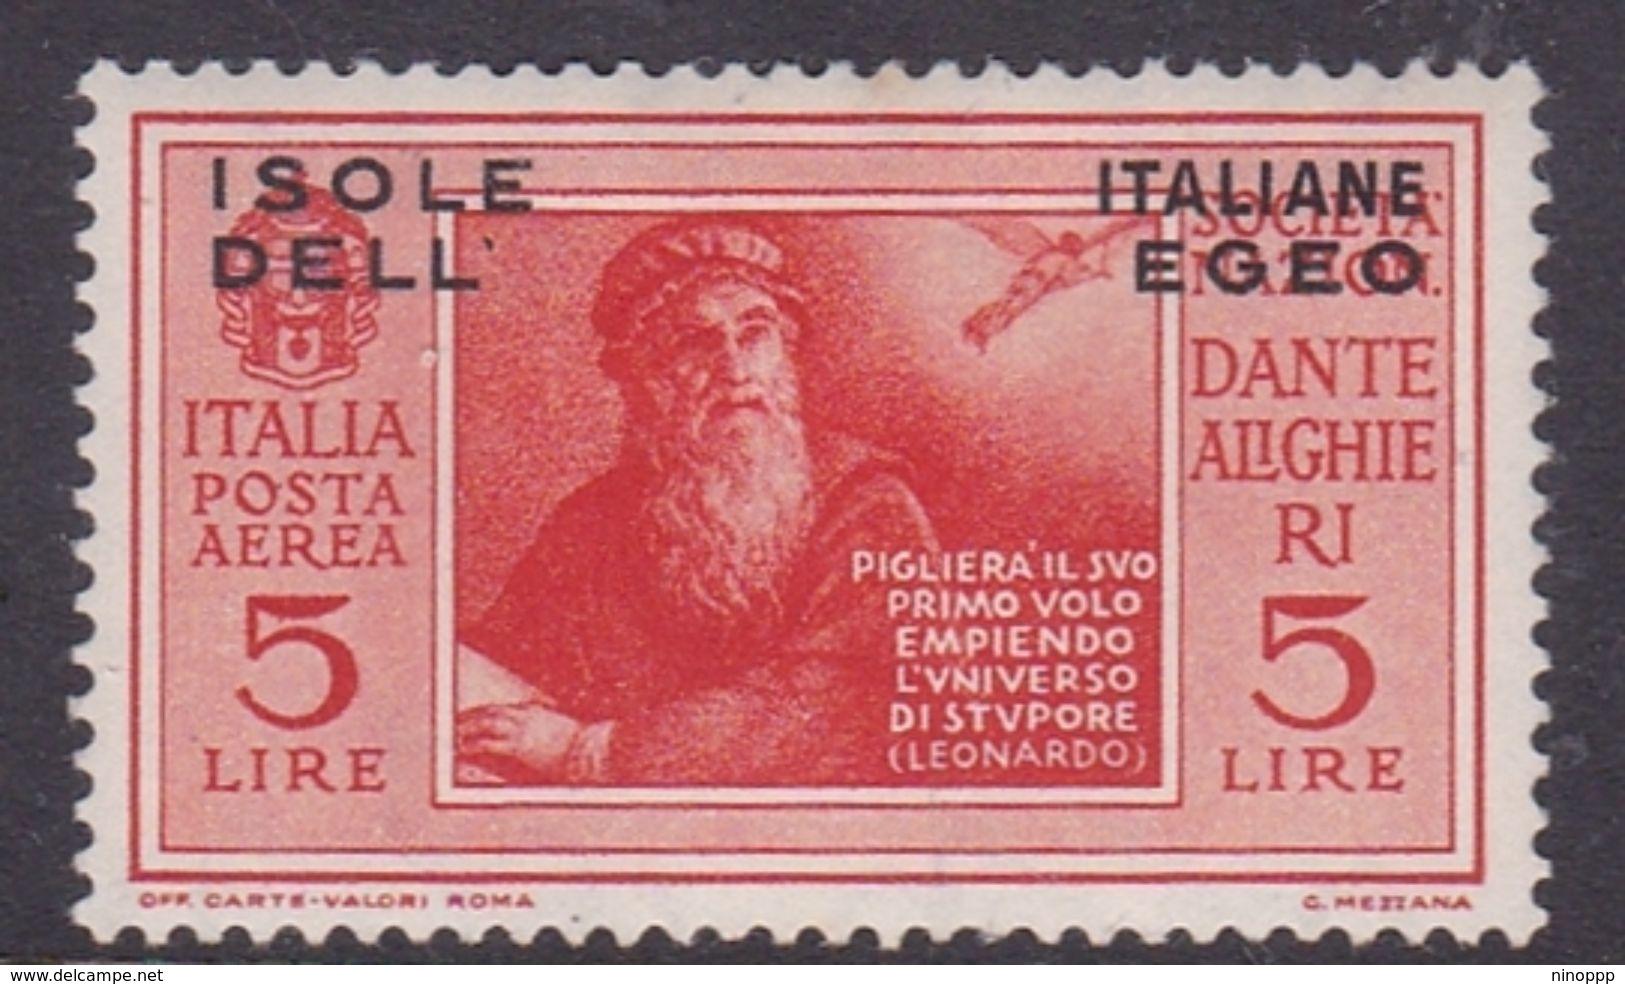 Italy-Colonies And Territories-Aegean General Issue-Rodi A11 1932 Air Mail Dante Alighieri 5 Lire Orange MH - Italië